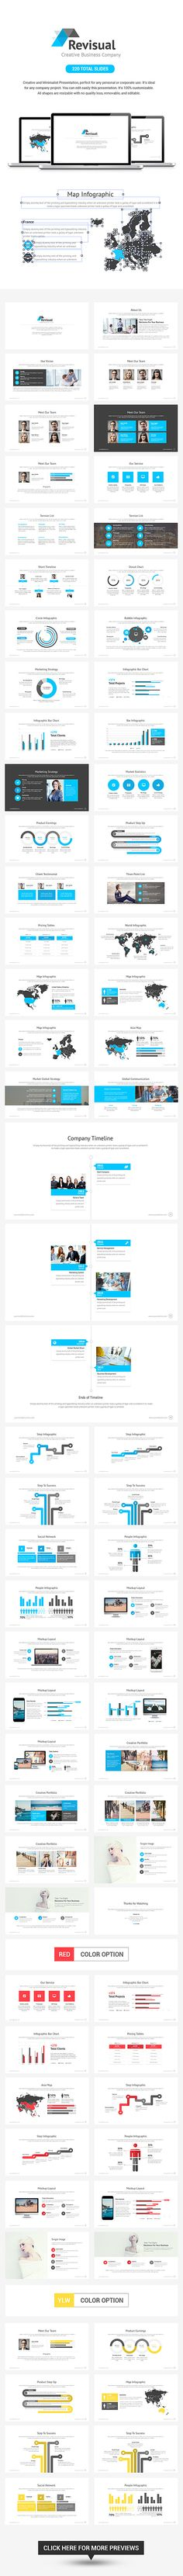 clean invoice template | invoice template, templates and cleanses, Invoice templates